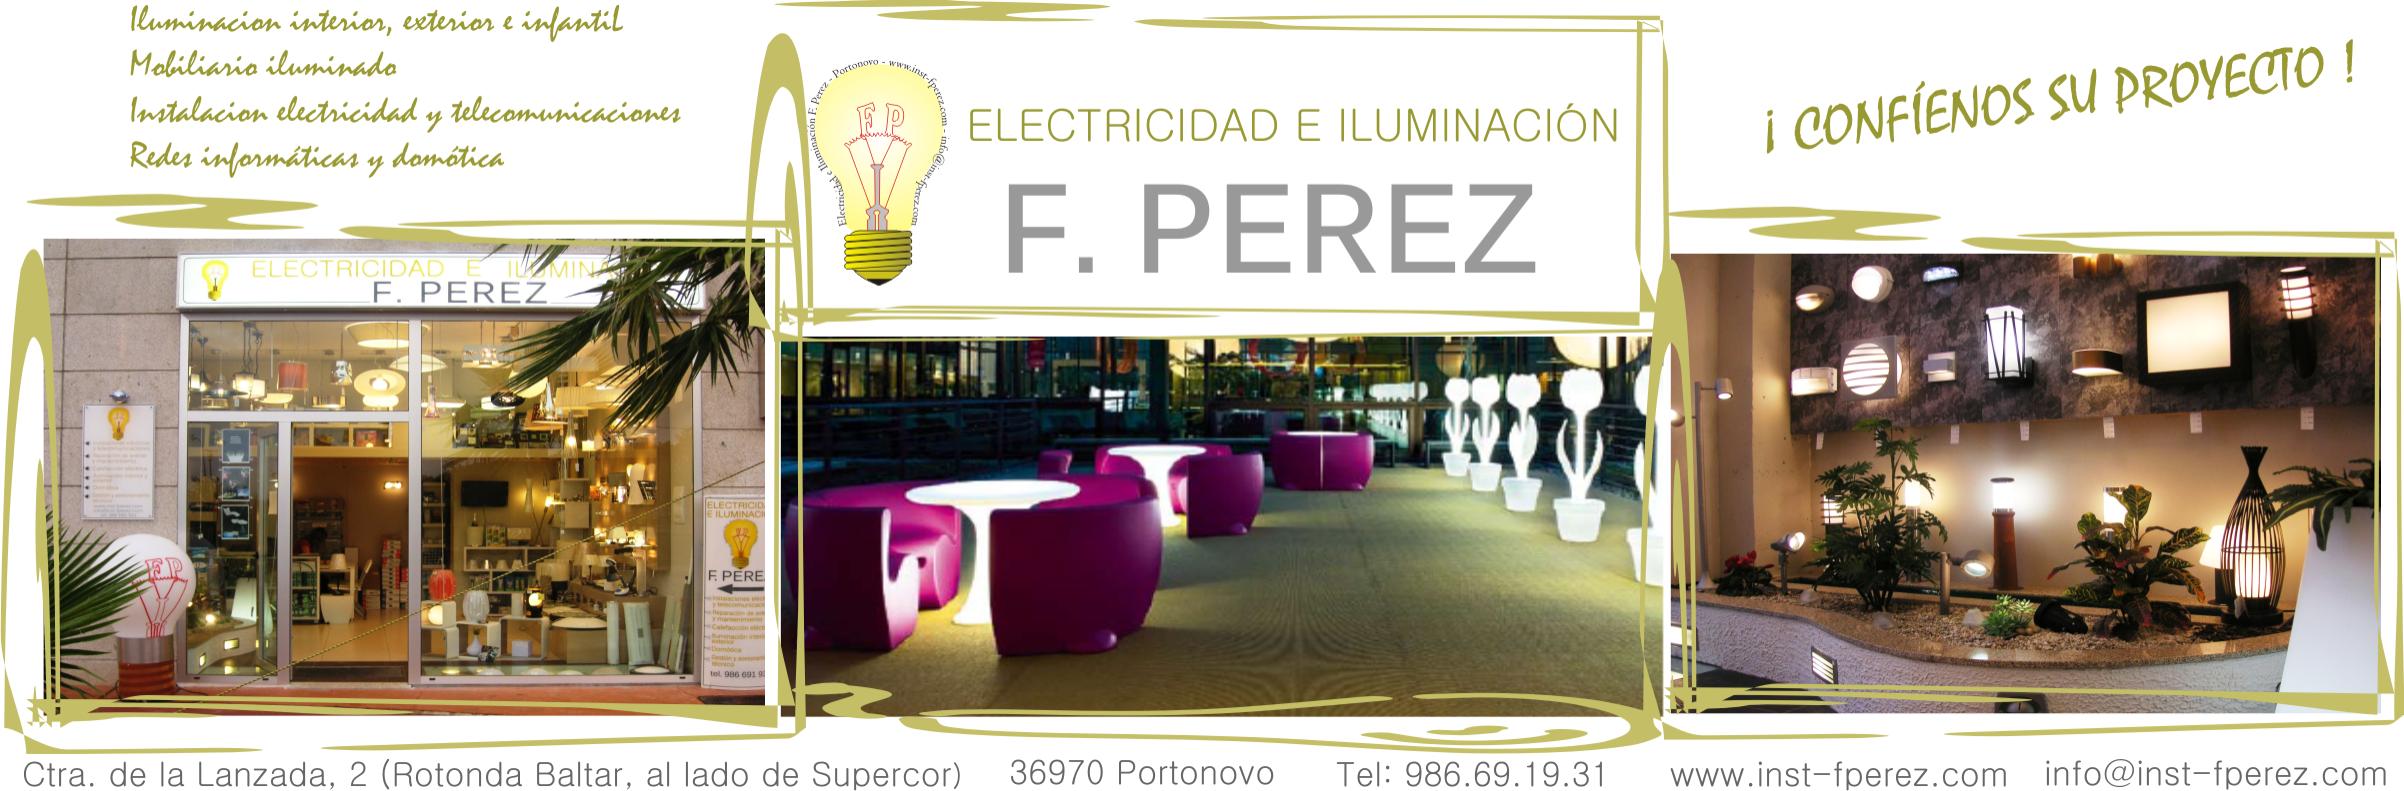 Electricidad E Iluminacion F. Perez